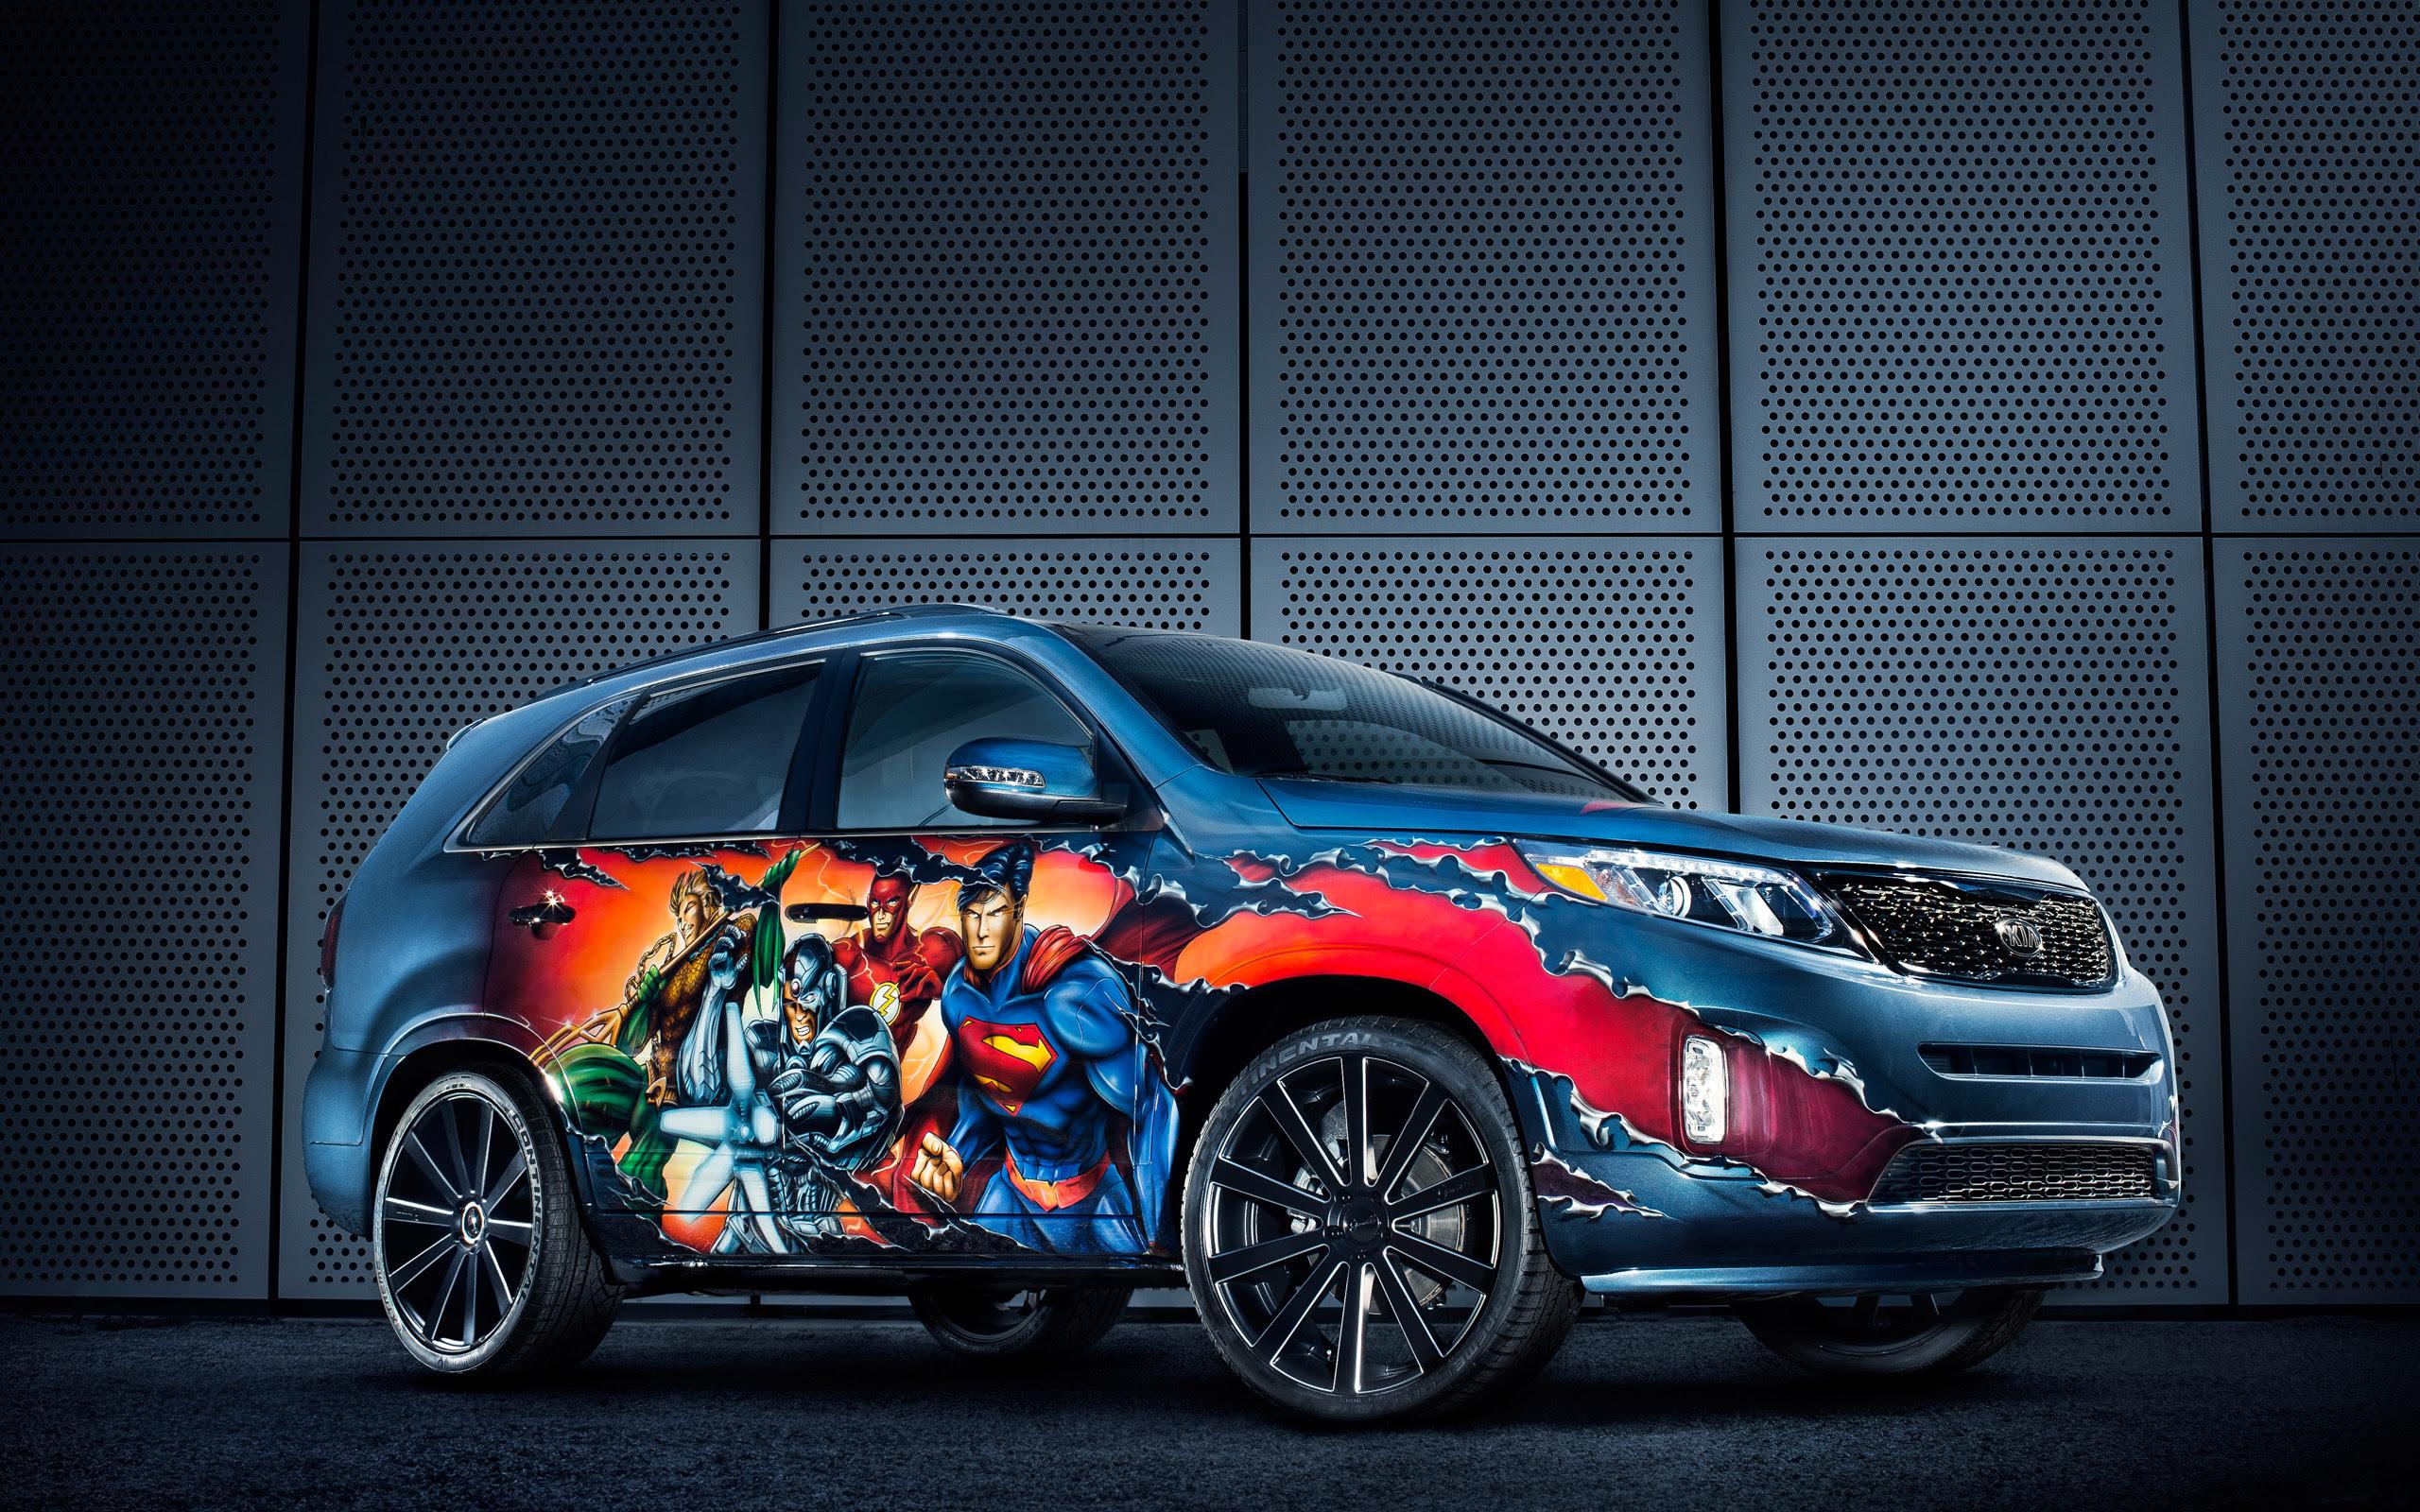 2013 Kia Justice League Sorento 2 Wallpaper | HD Car ...